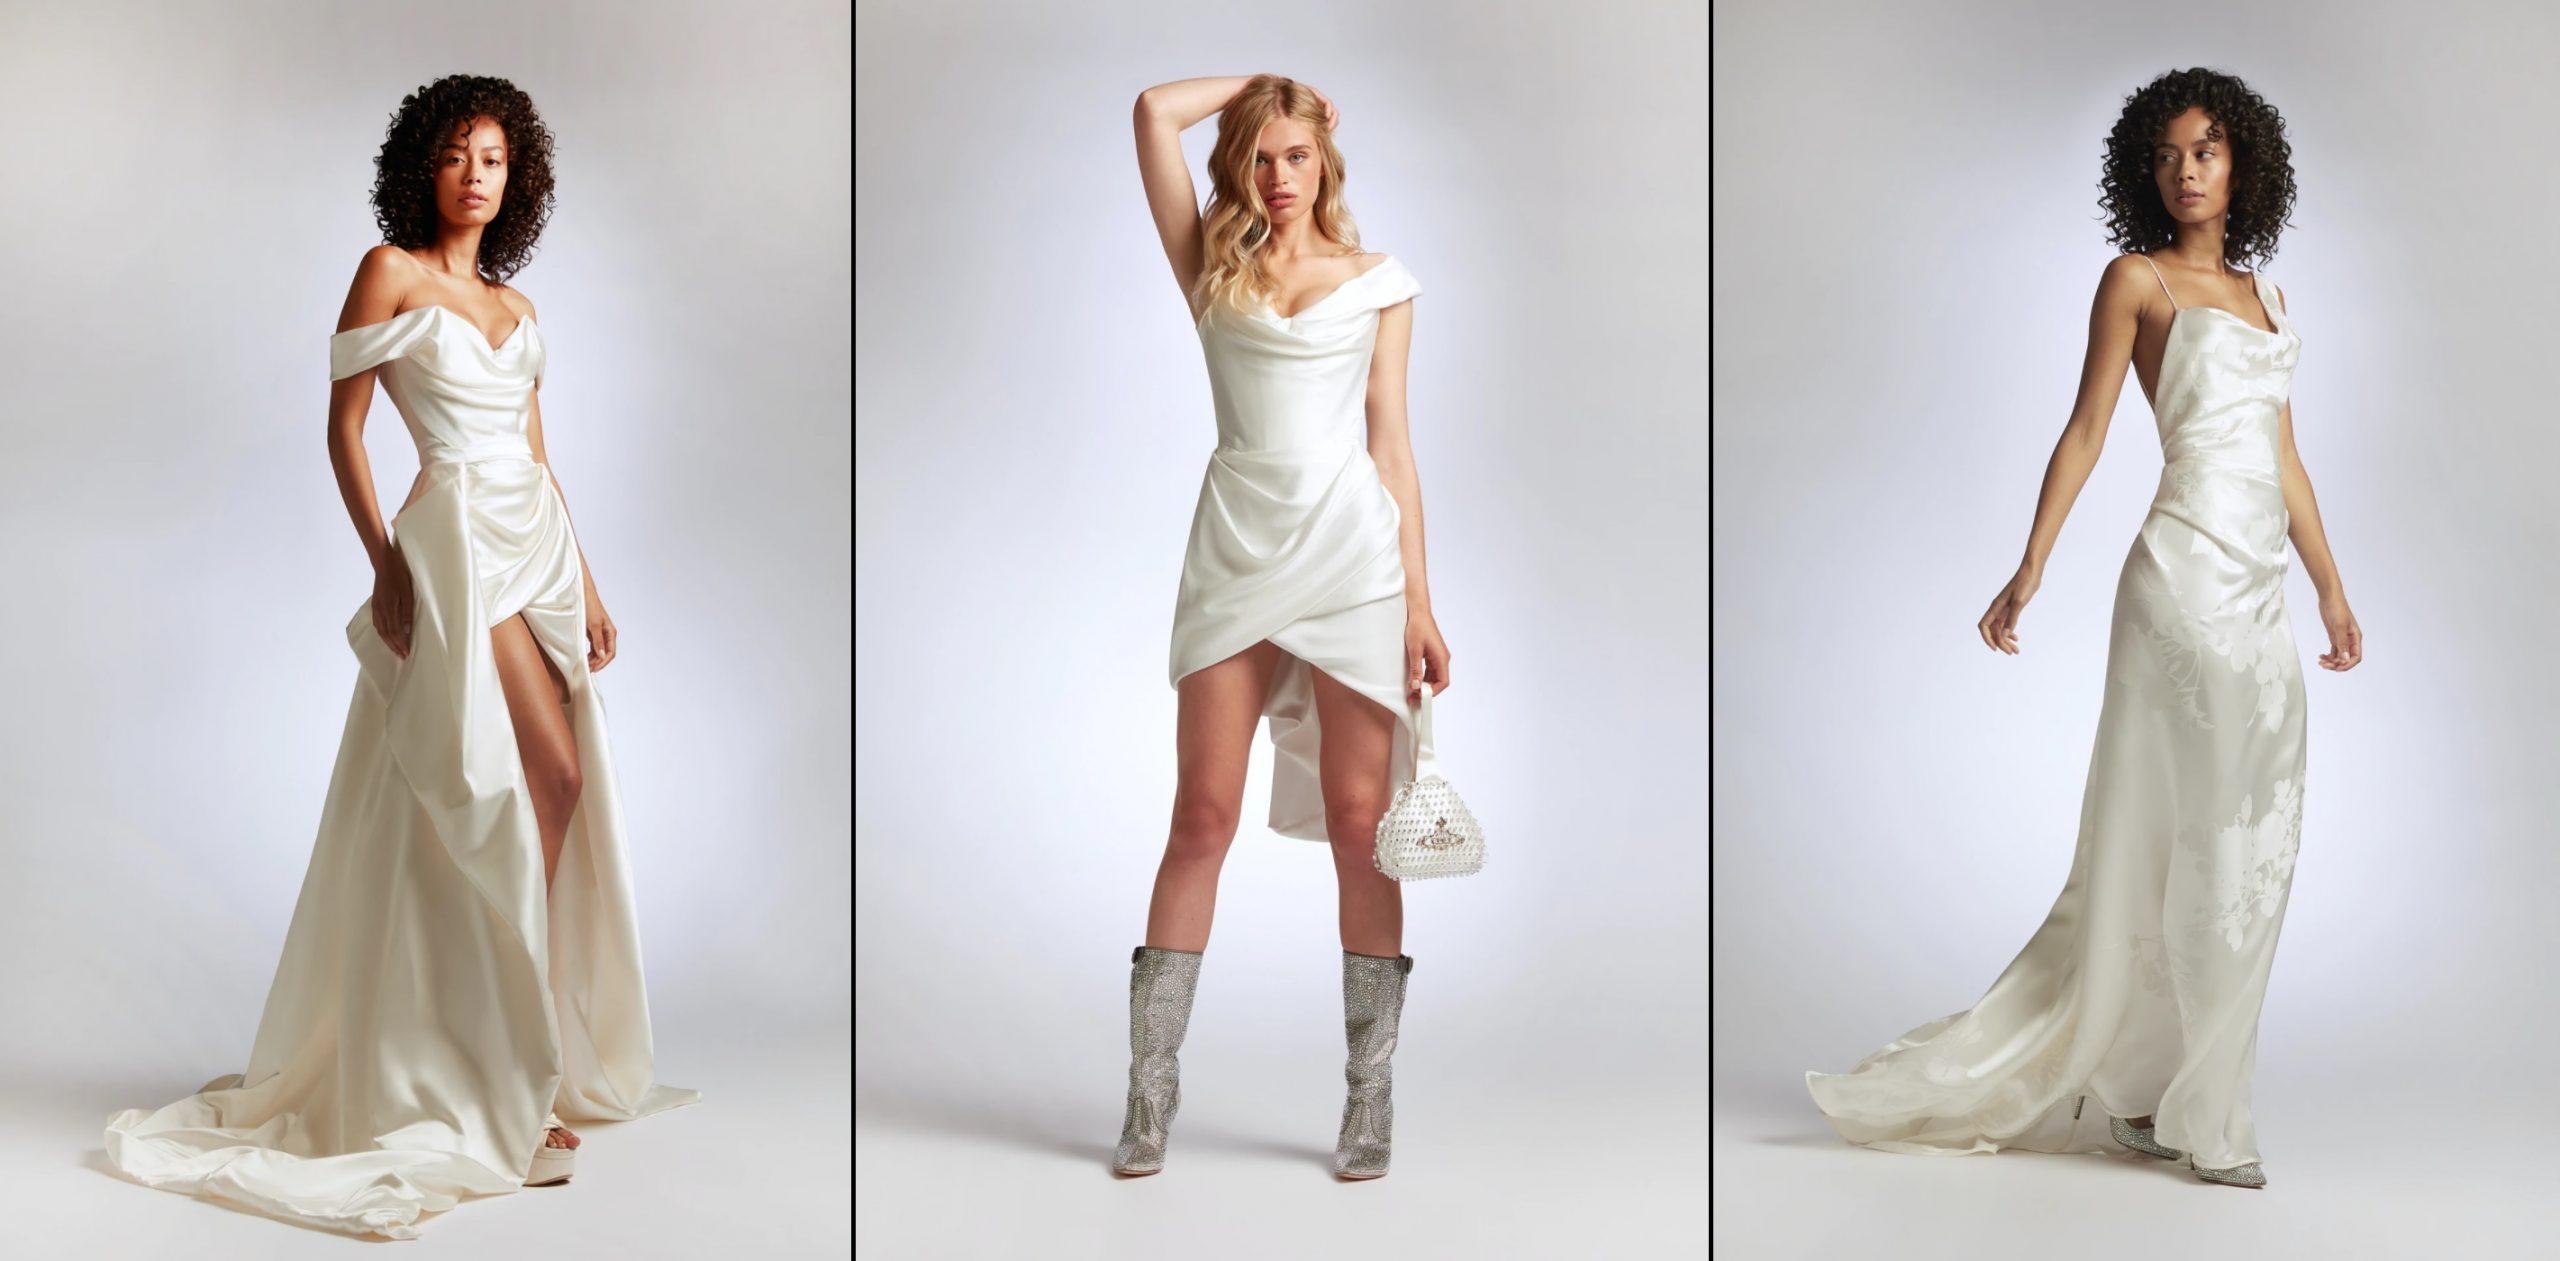 vivenne-Westwood-boots